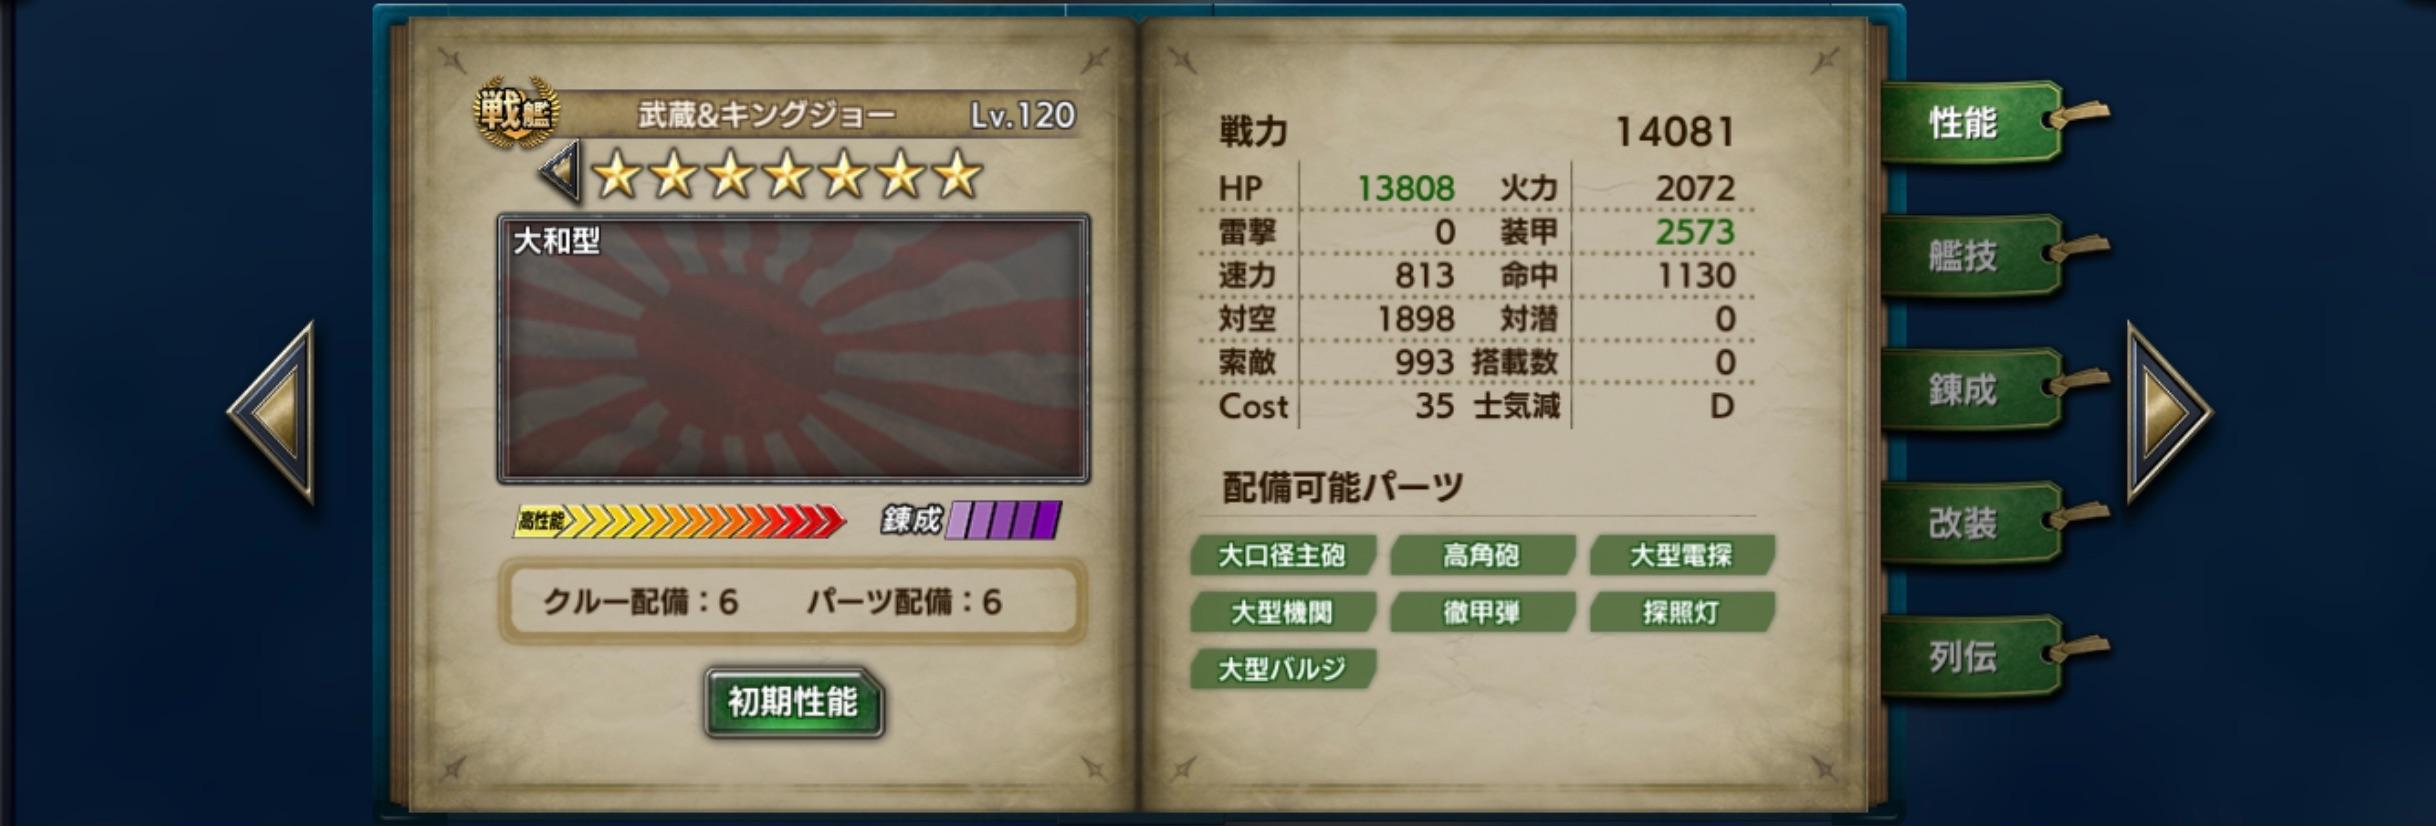 MusashiK-performance